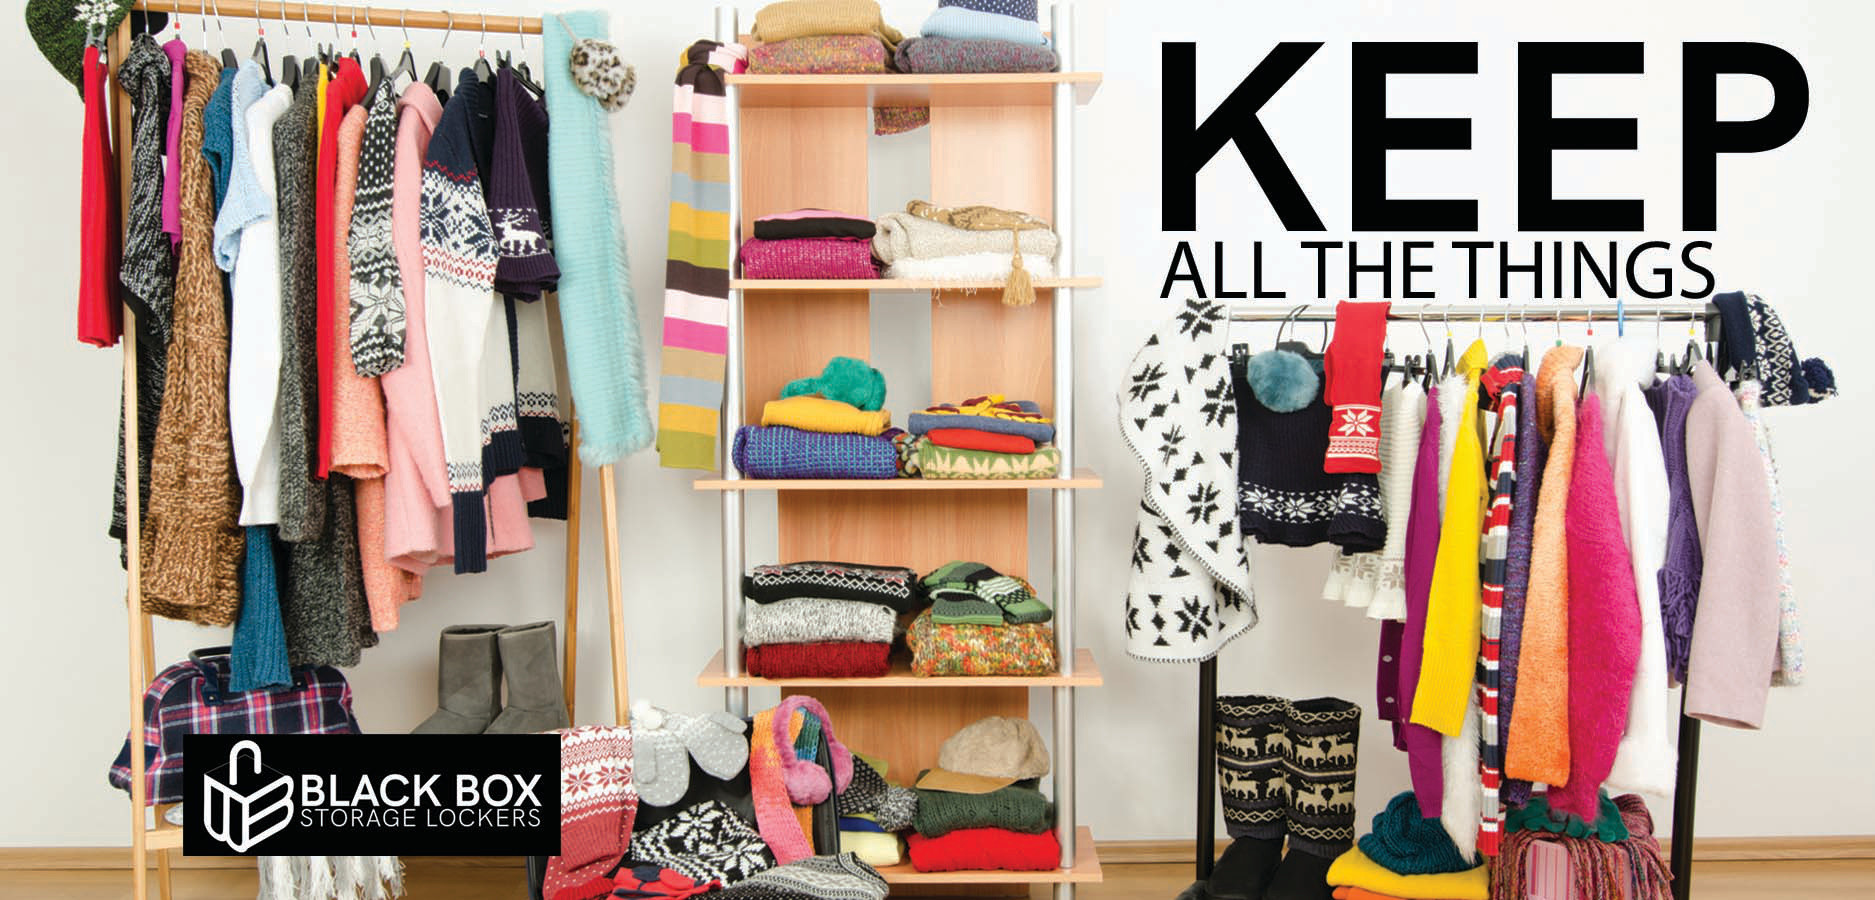 BlackBox_WebsiteHeader_Clothes.jpg